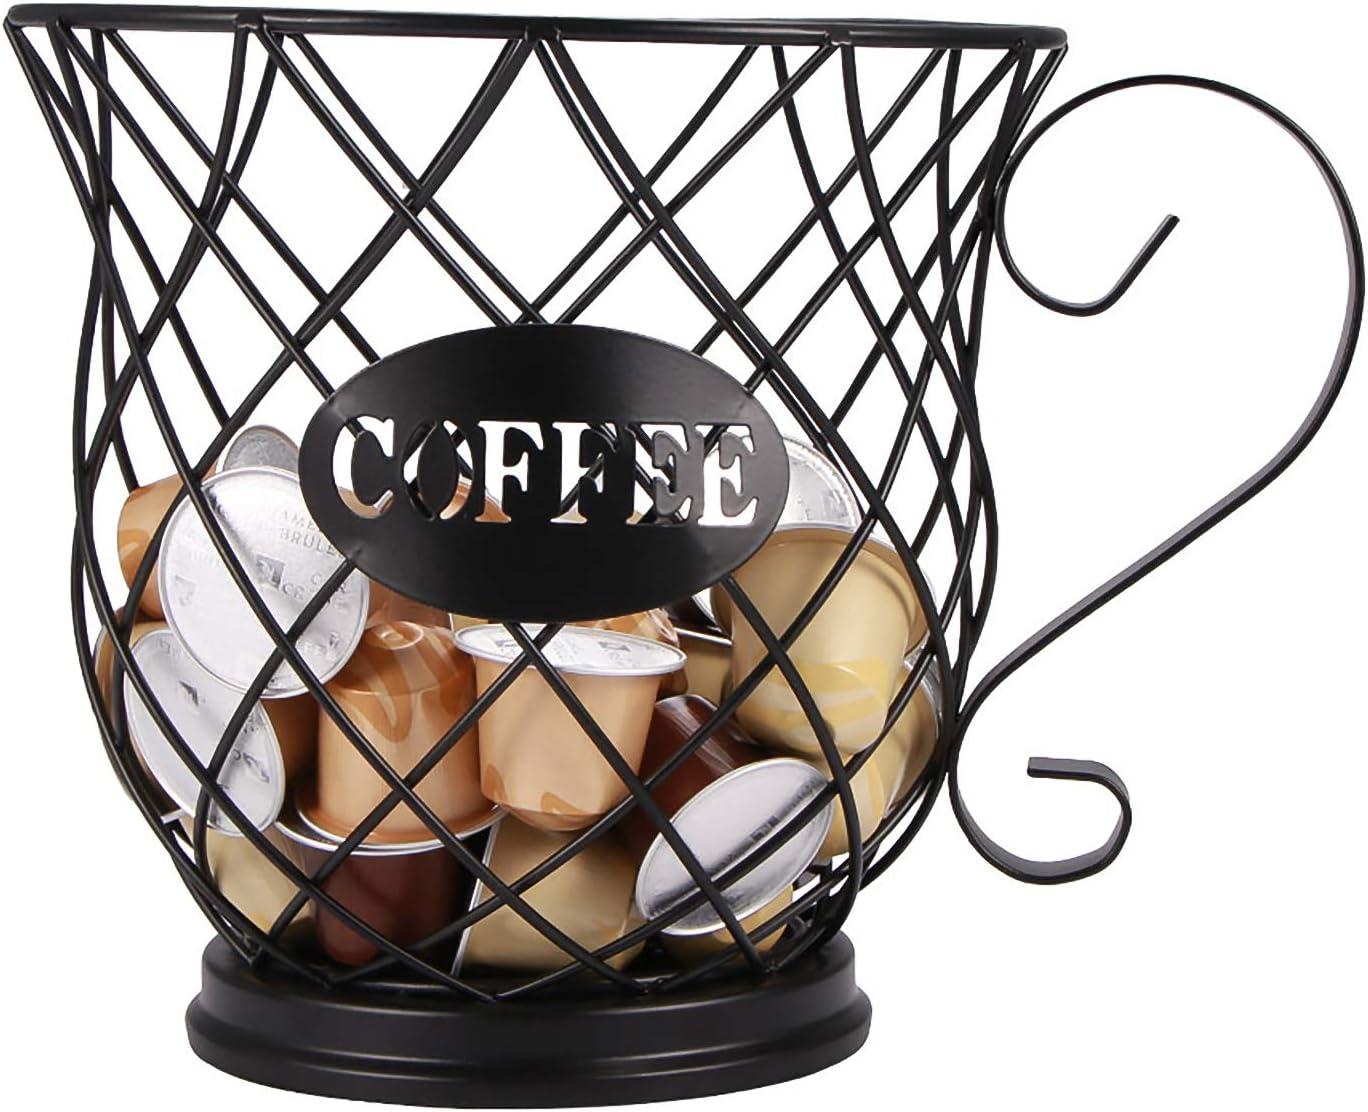 Almacenamiento de cocina YChoice365 Soporte para c/ápsulas de caf/é Organizador de c/ápsulas de caf/é vintage Canasta de almacenamiento de caf/é Soporte para c/ápsulas de caf/é con asa Universal